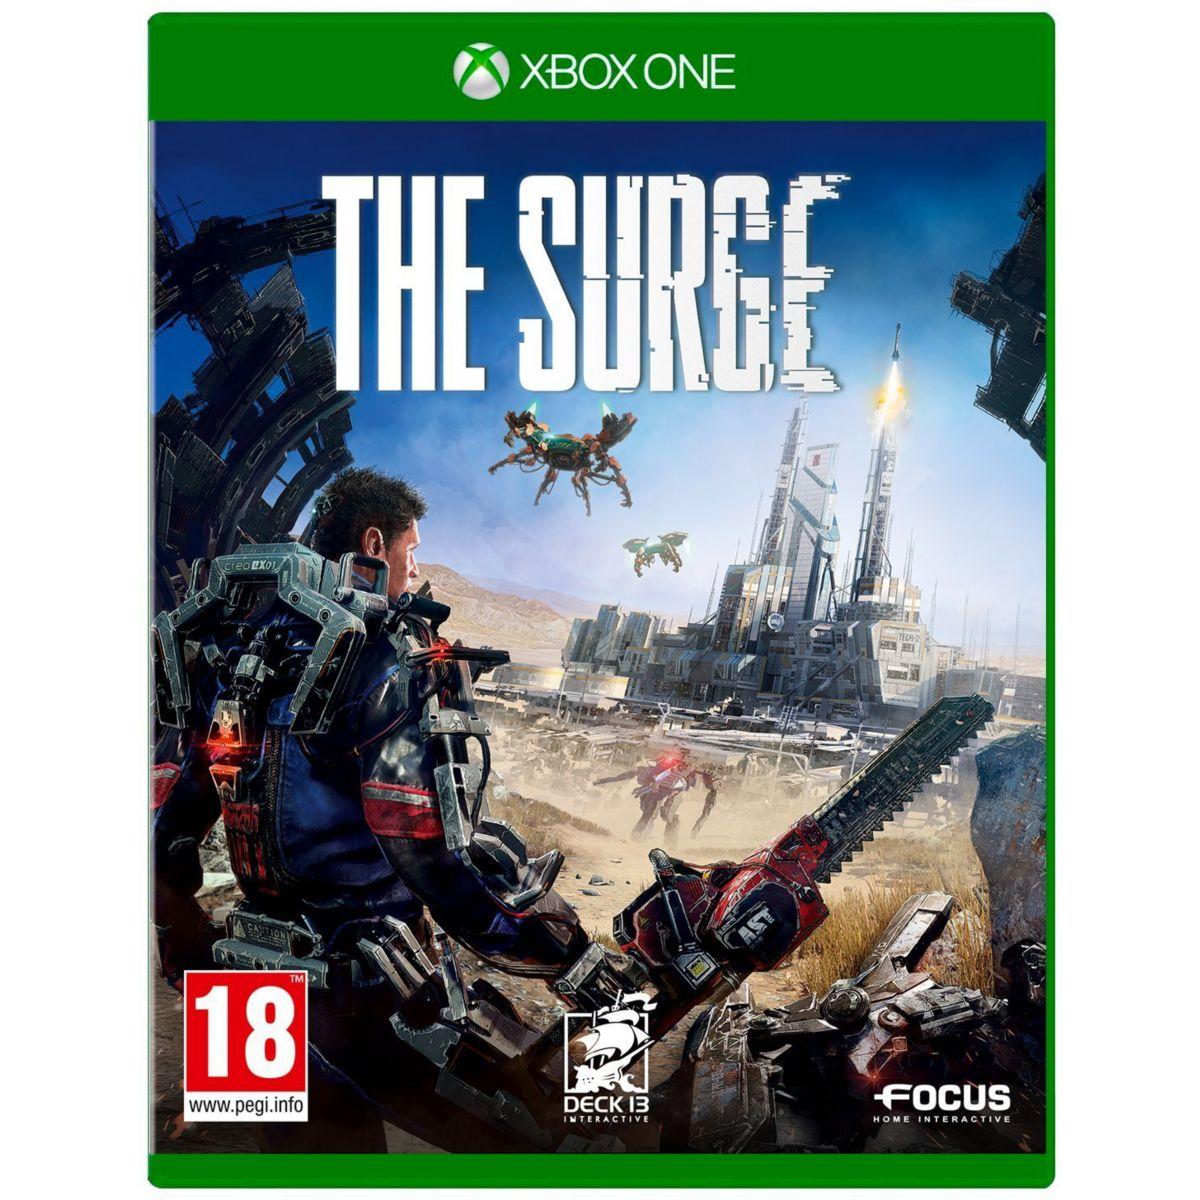 Jeu Xbox One FOCUS The Surge